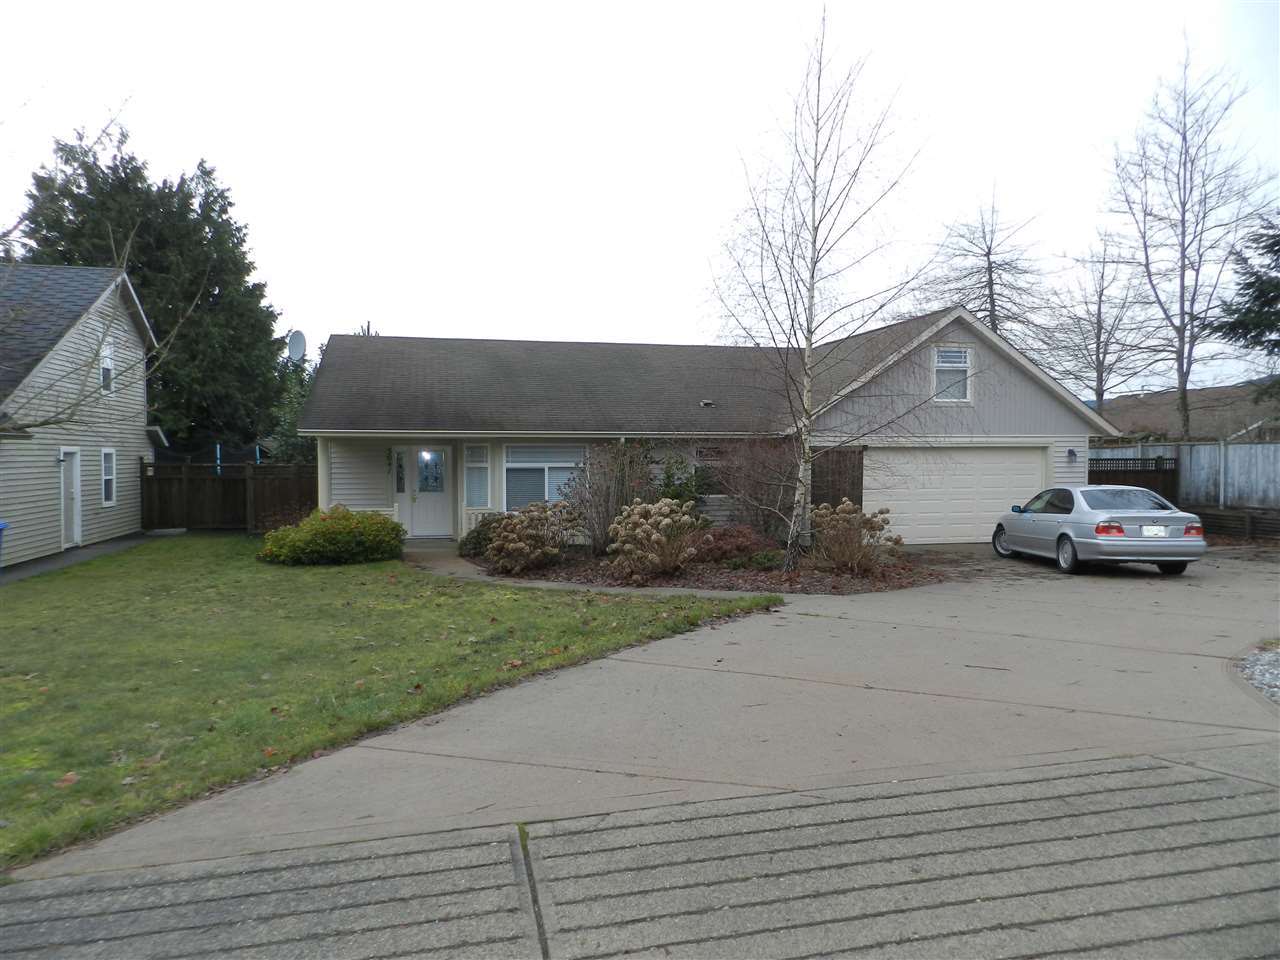 5641 NICKERSON ROAD, Sechelt, BC V0N 3A7